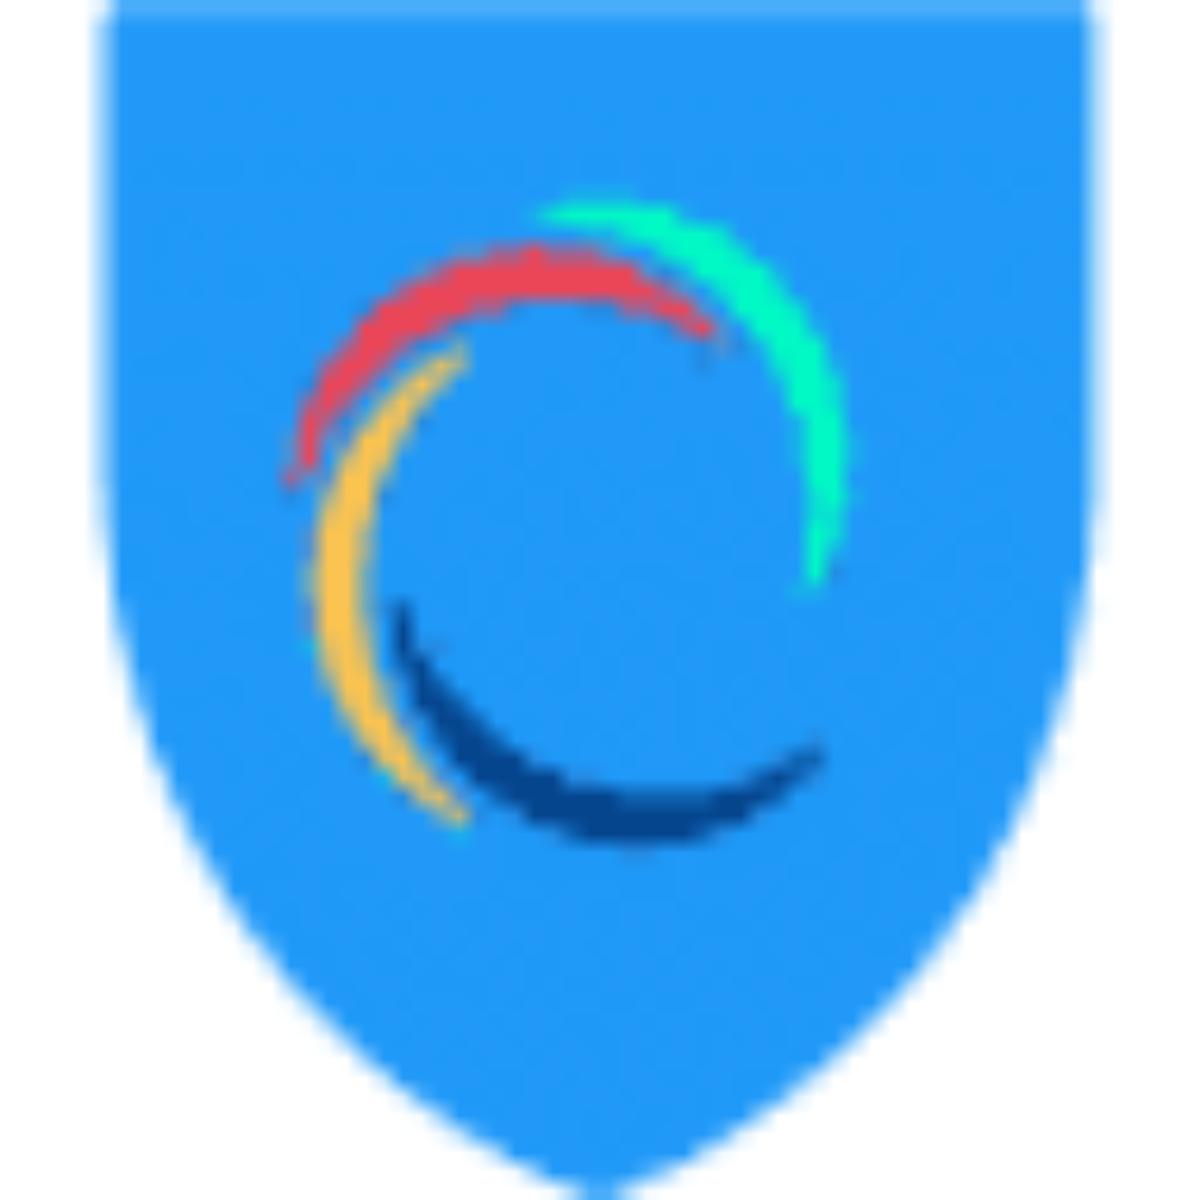 Hotspot Shield 10 15 3 Download For Windows 7 10 8 32 64bit